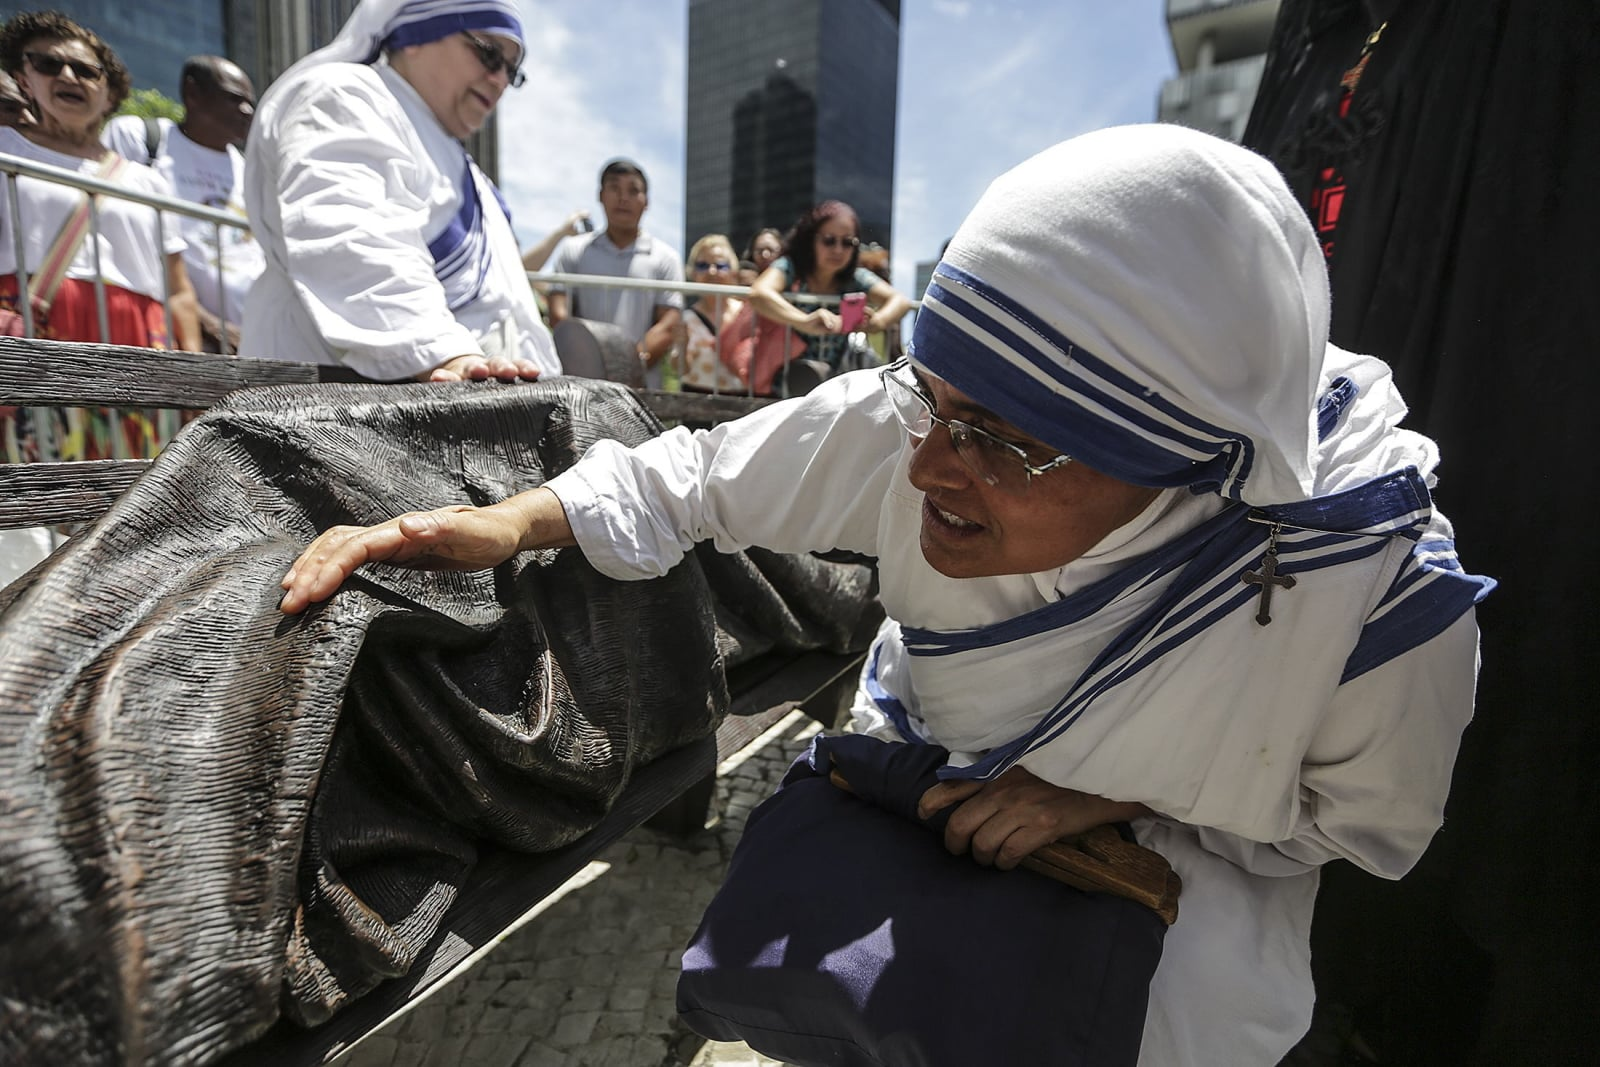 Bieda w Brazylii fot. EPA/ANTONIO LACERDA